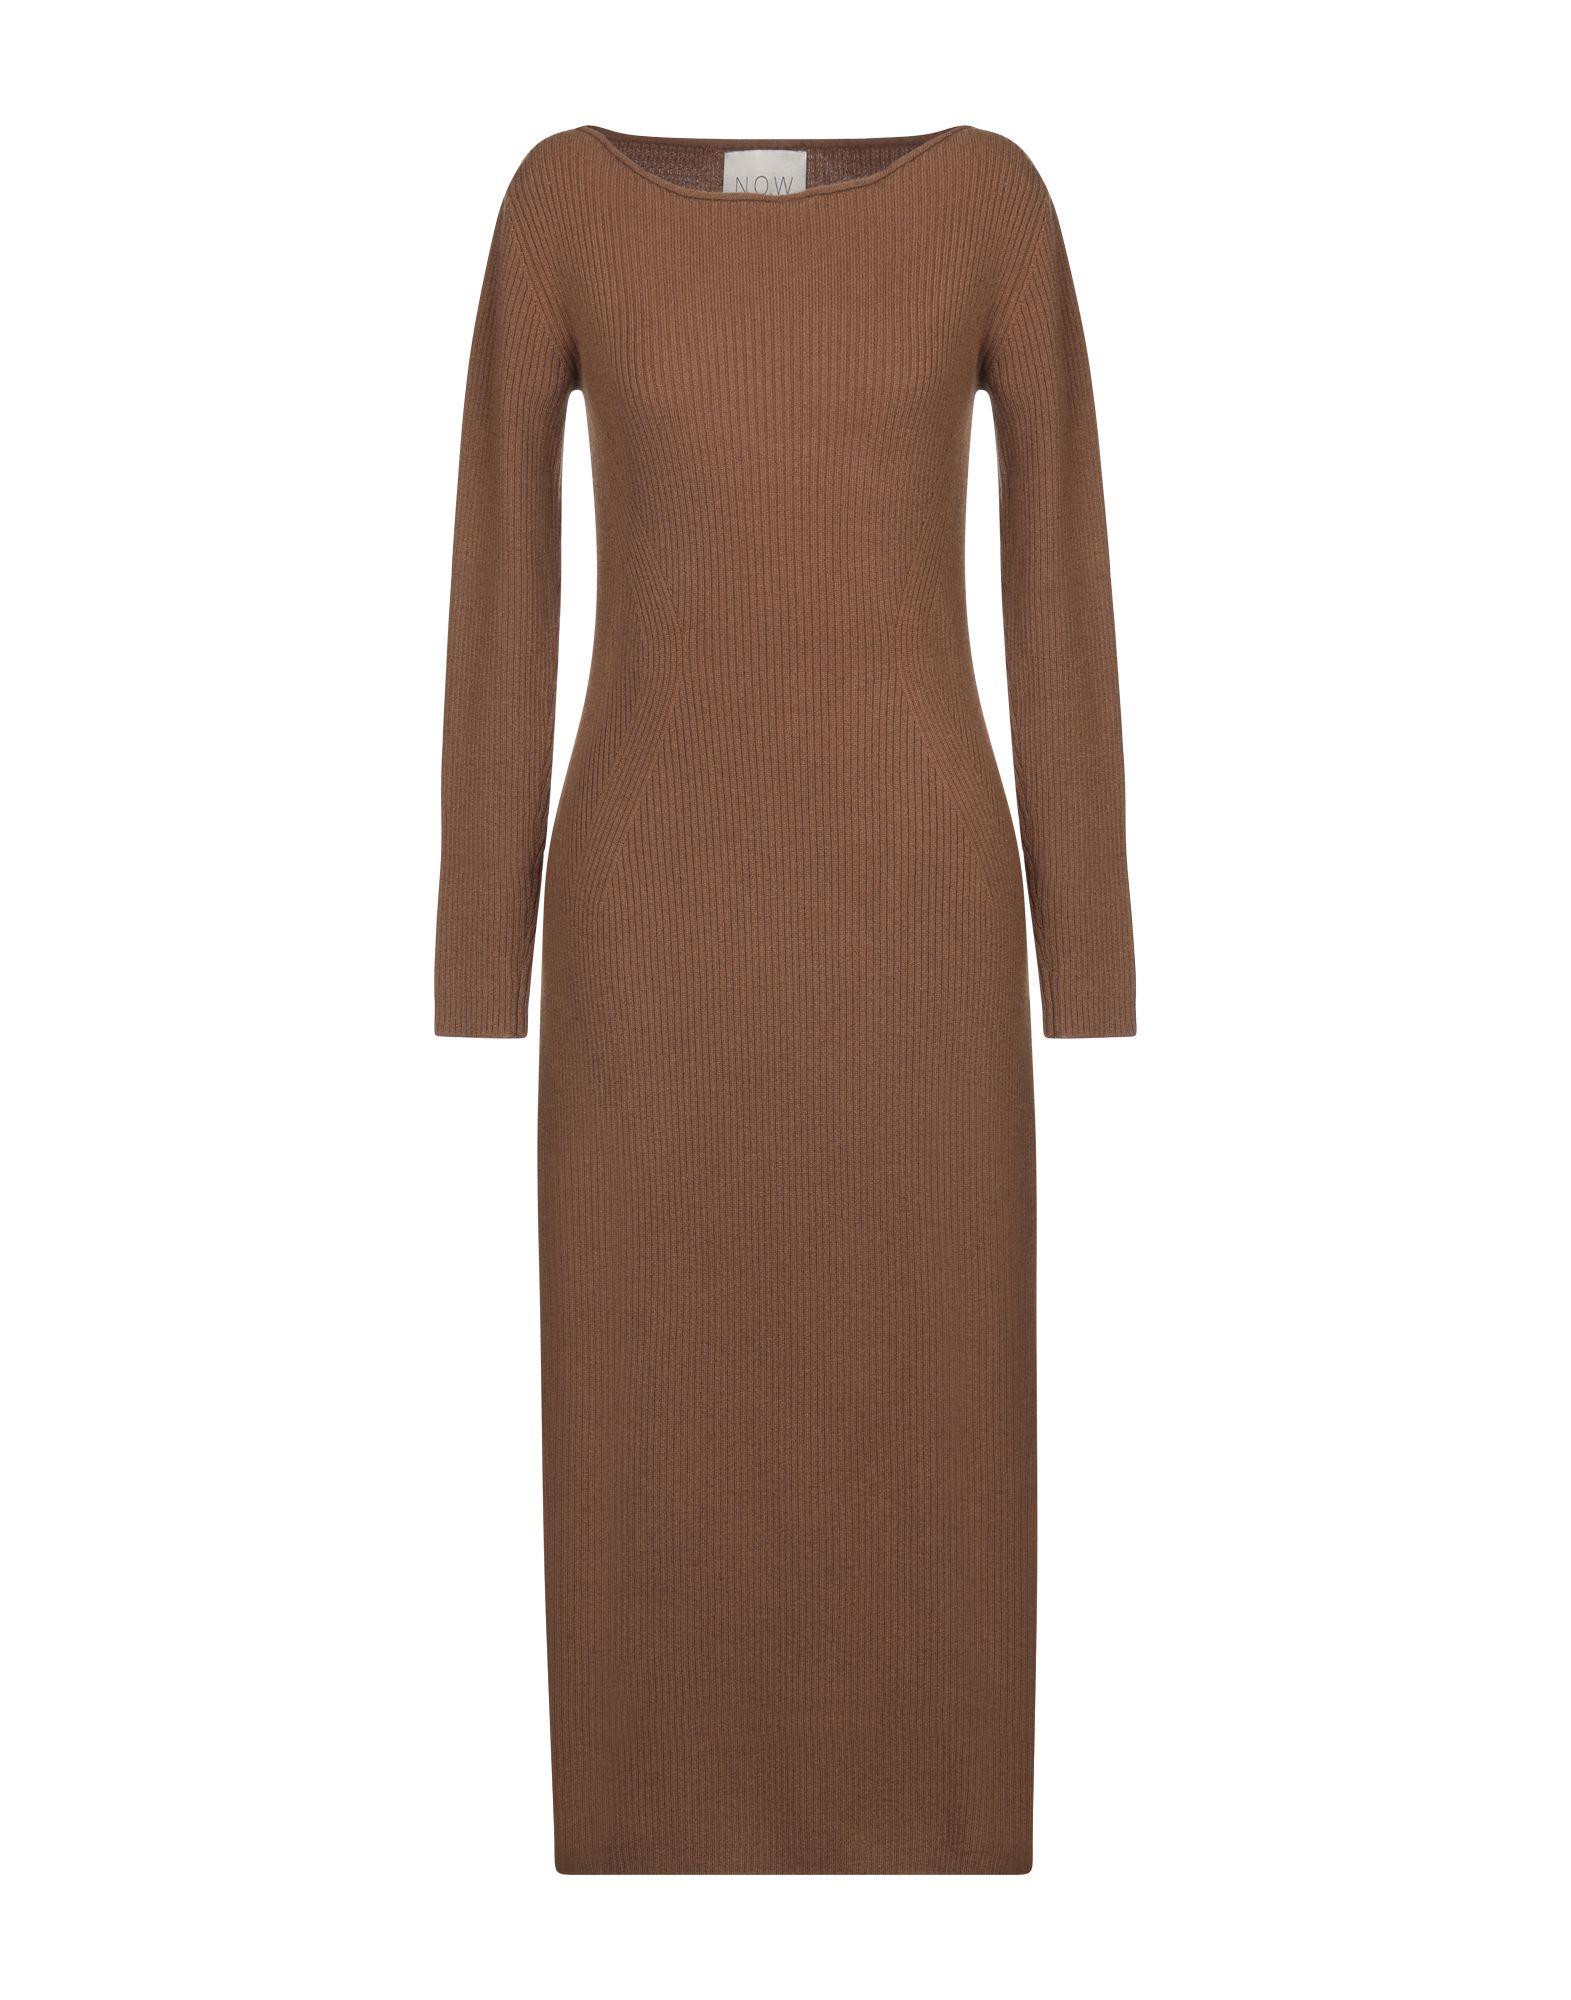 N.O.W. ANDREA ROSATI CASHMERE Платье длиной 3/4